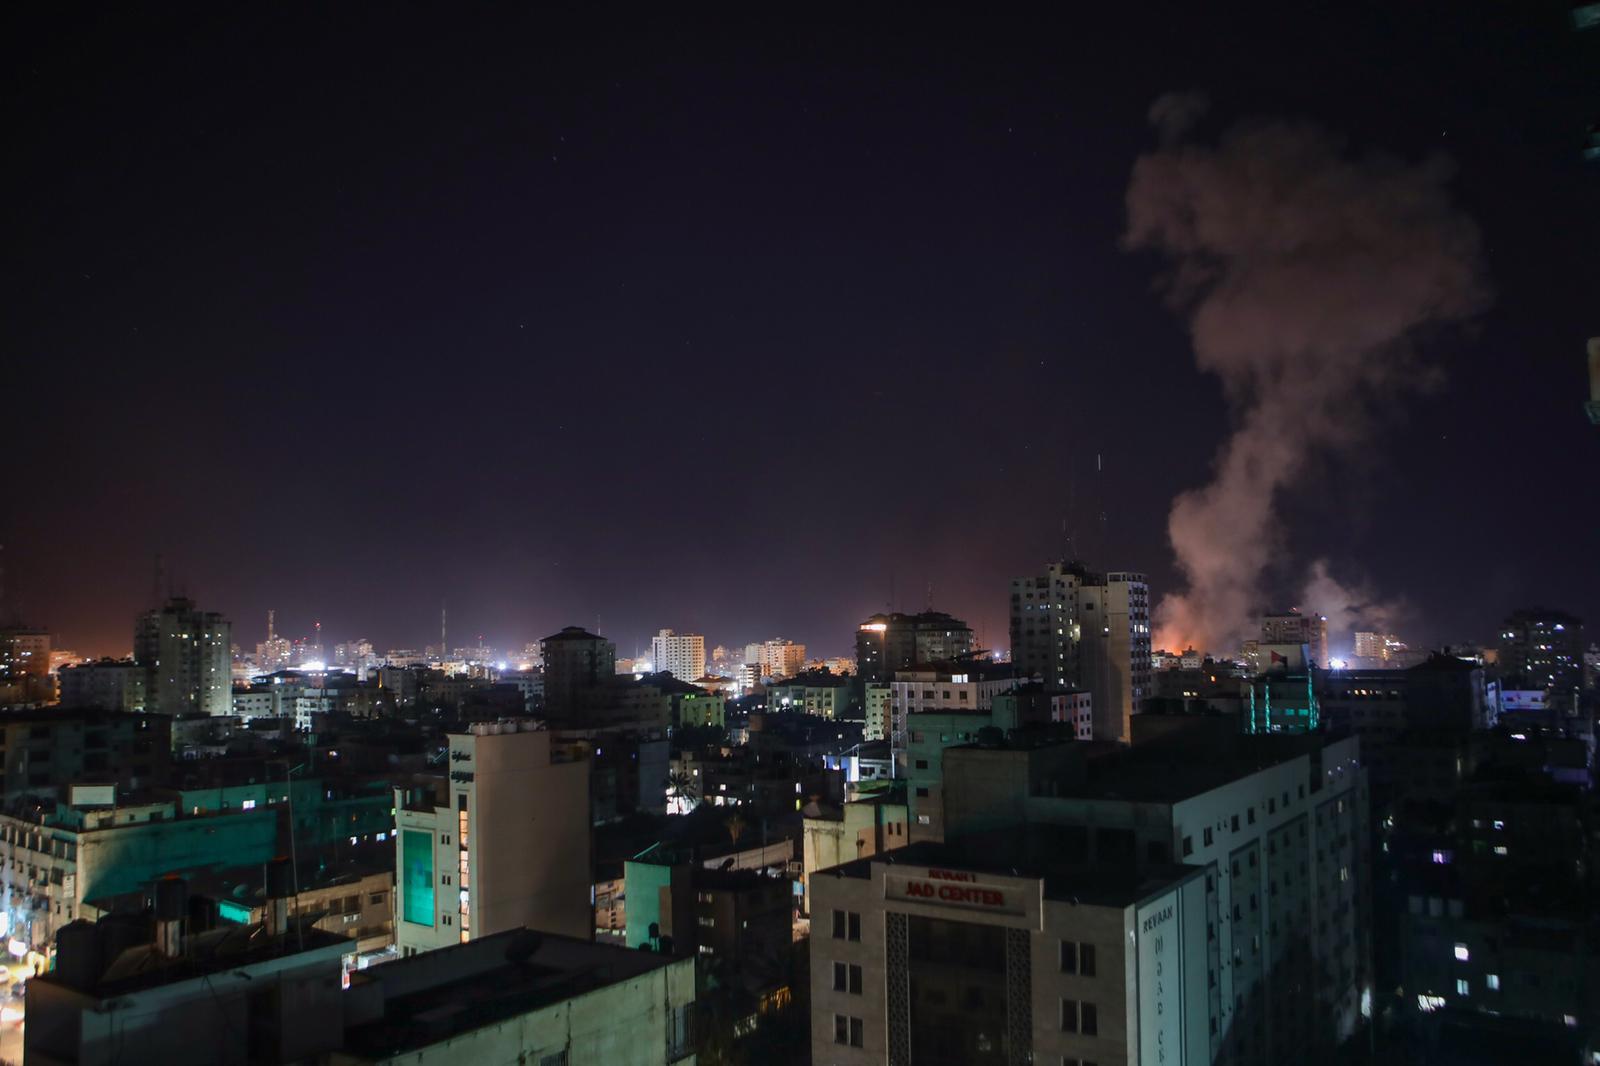 Israeli army strikes several targets in Gaza | Middle East Eye